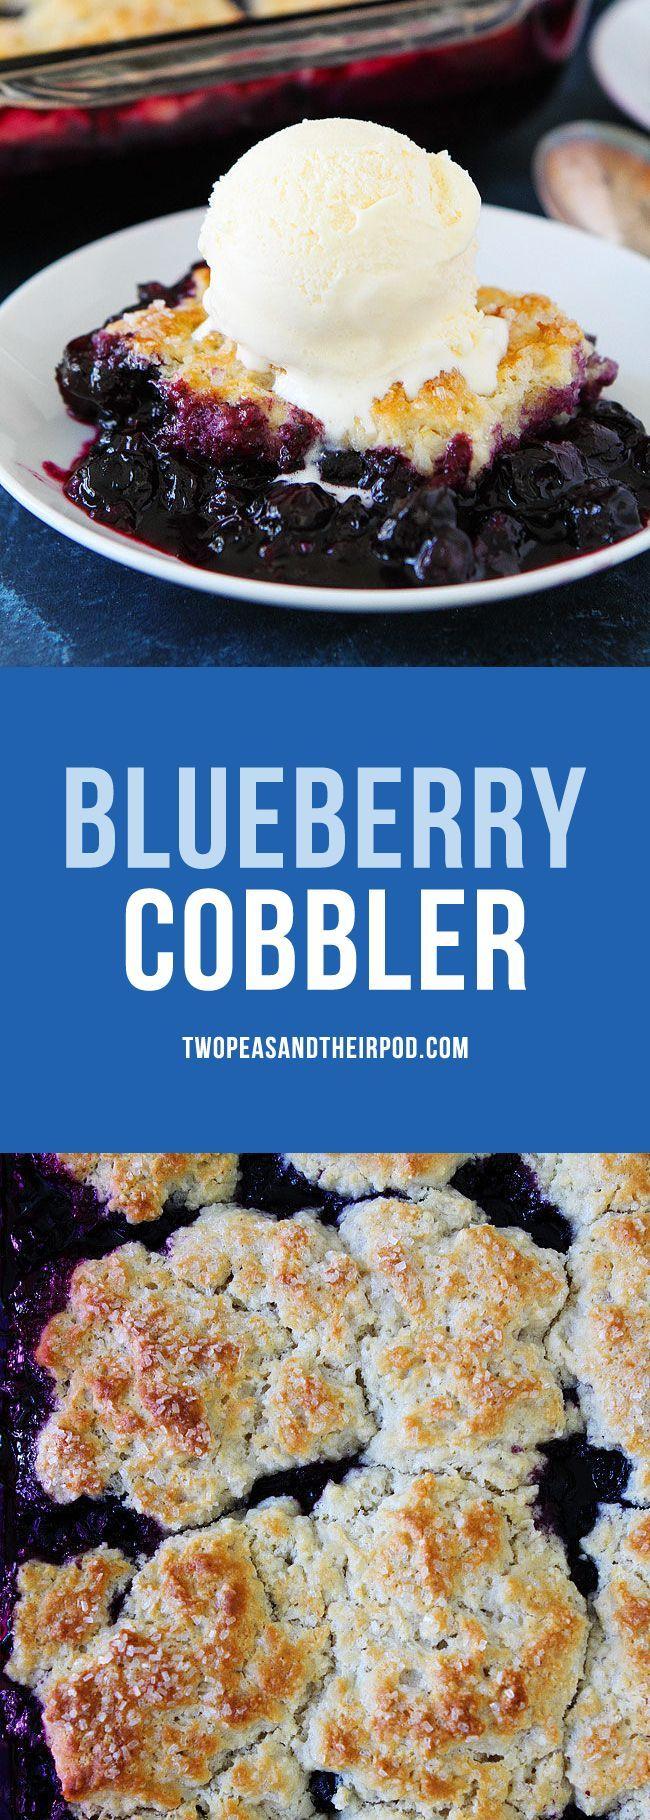 25+ best ideas about Pecan cobbler on Pinterest | Pecan ...